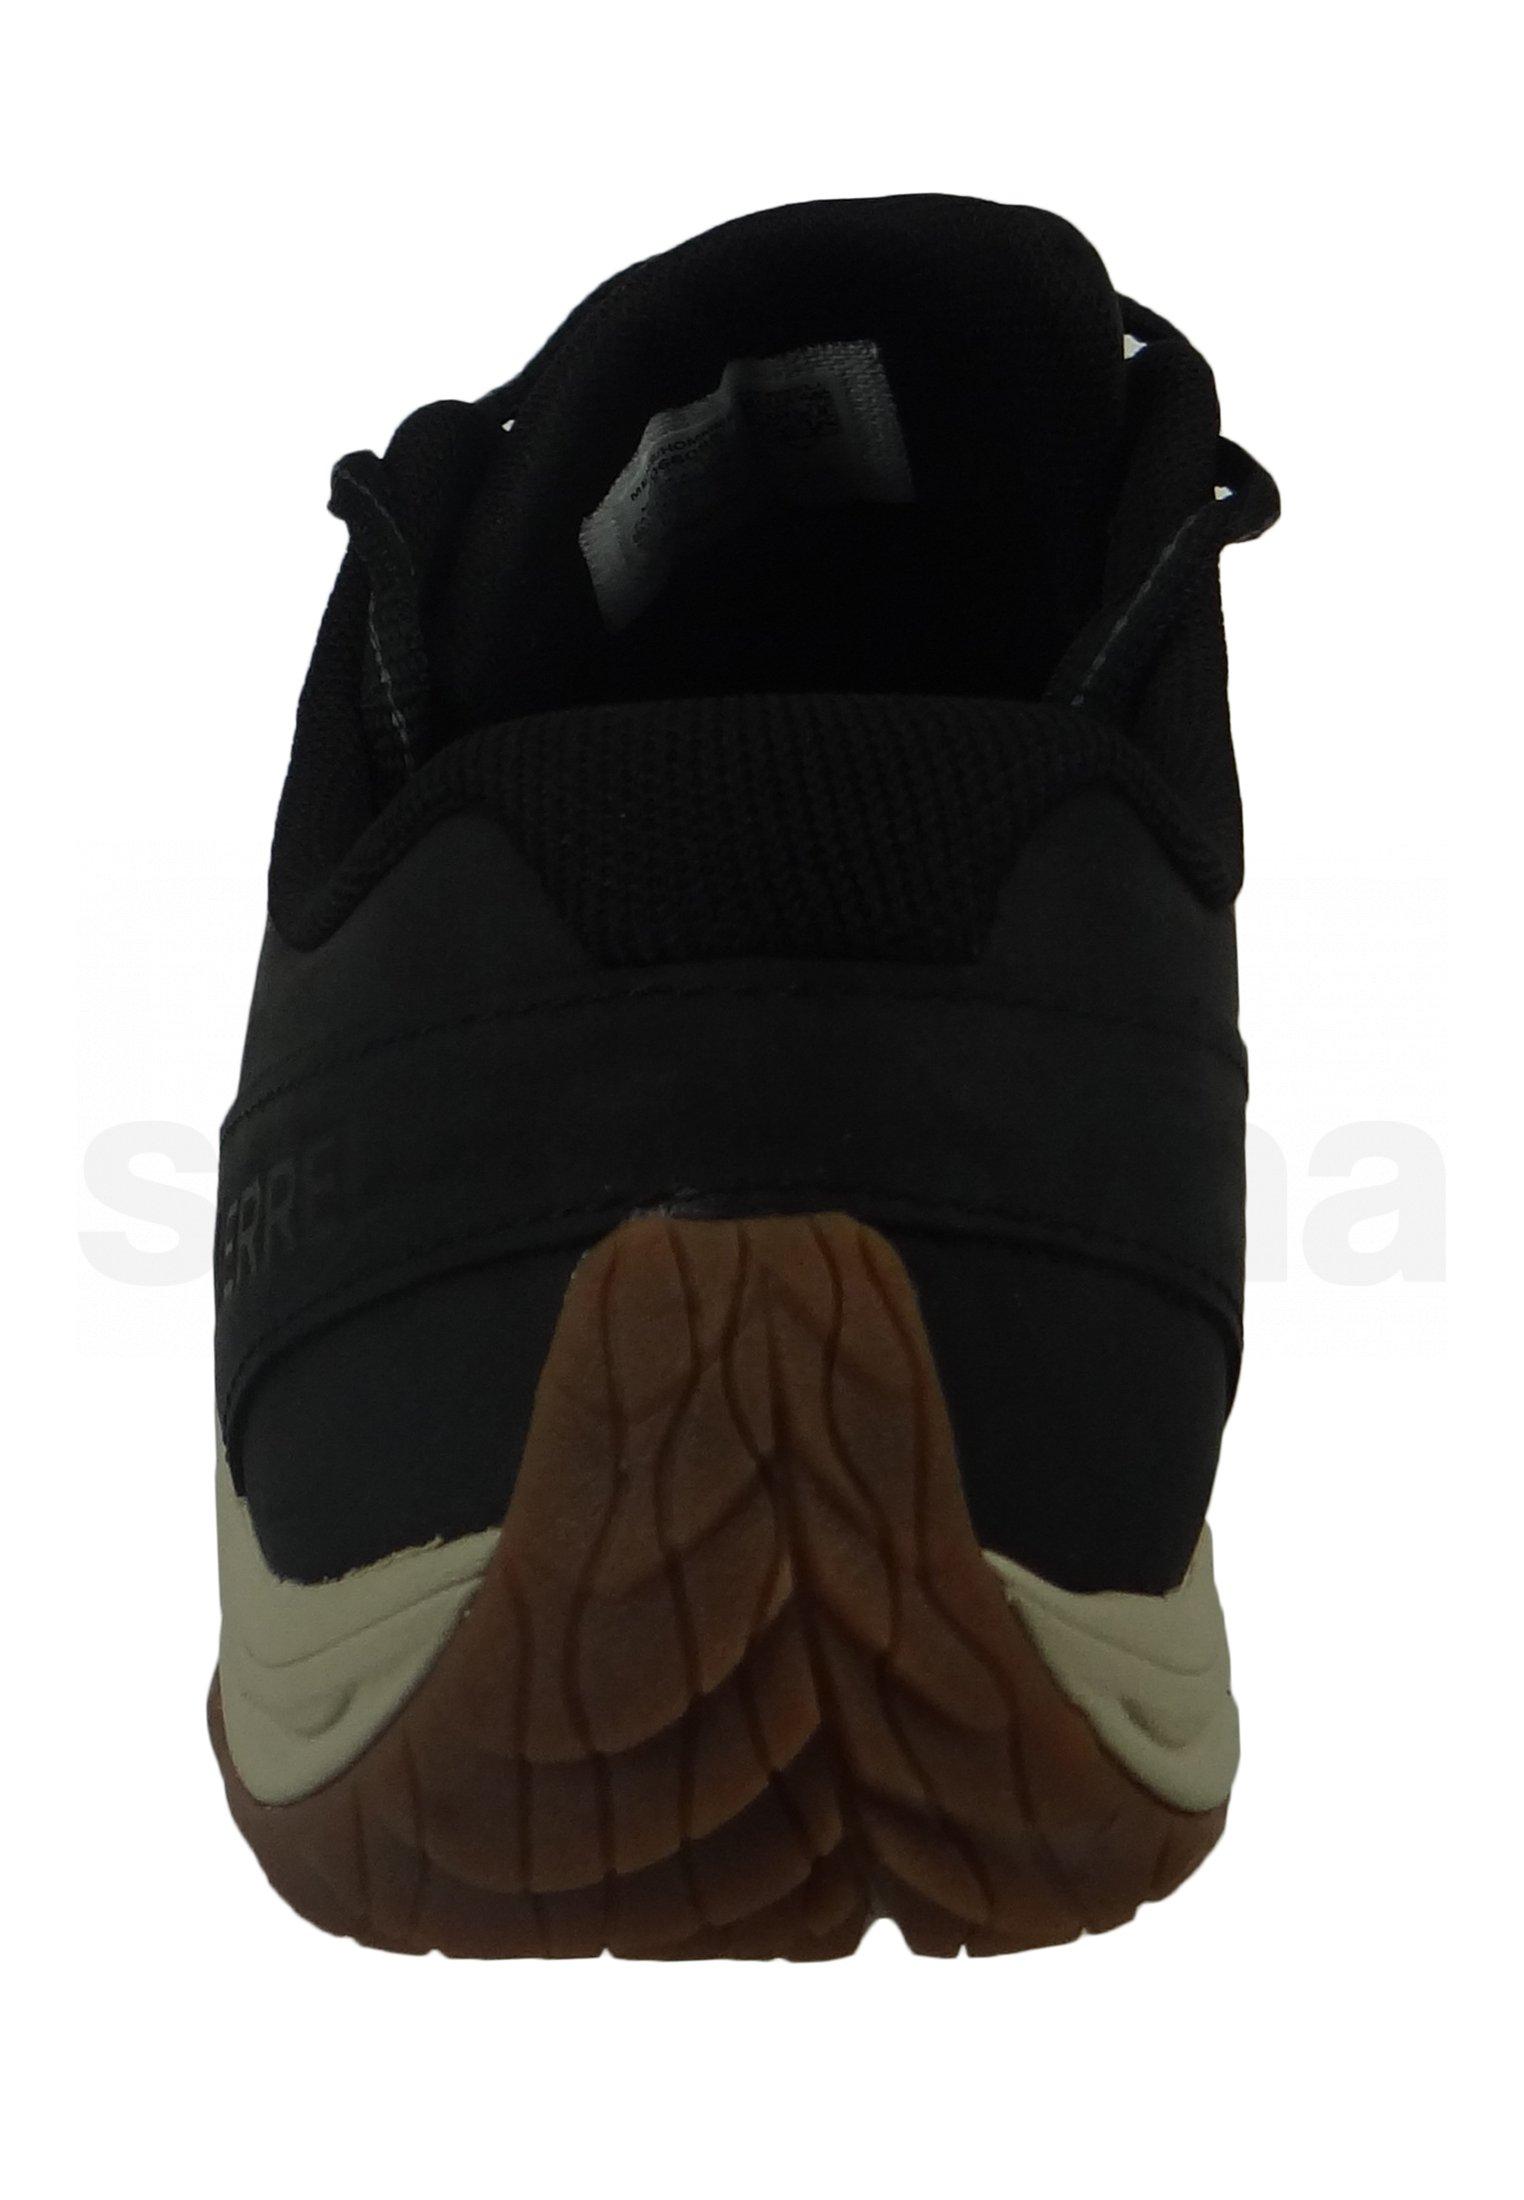 Obuv Merrell Trail Glove 5 LTR M - černá